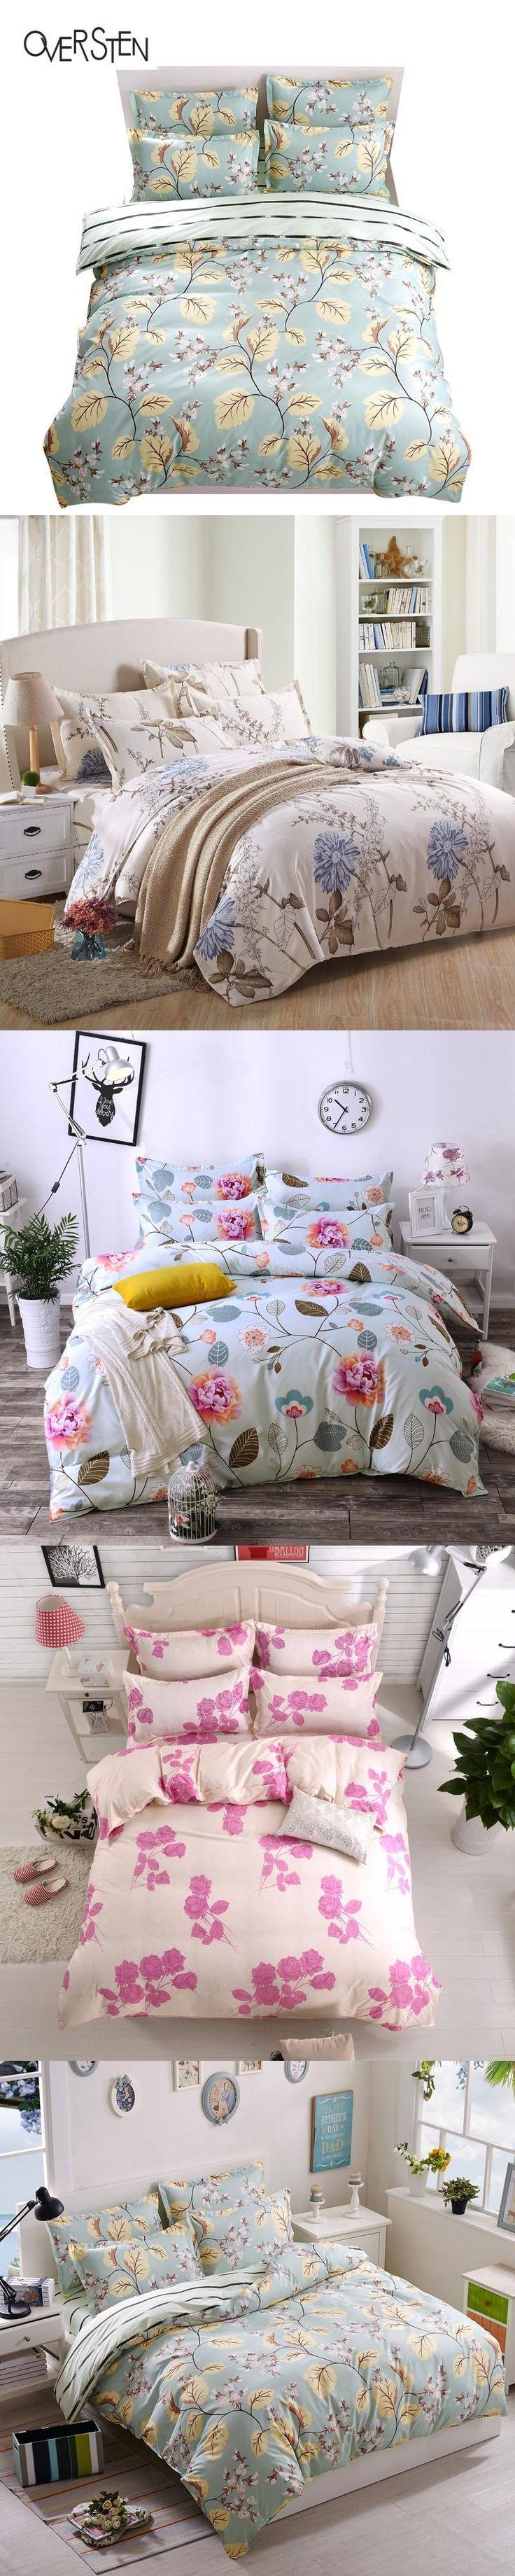 oversten korean style double single bedding set twin queen king size duvet cover 2 1 plant